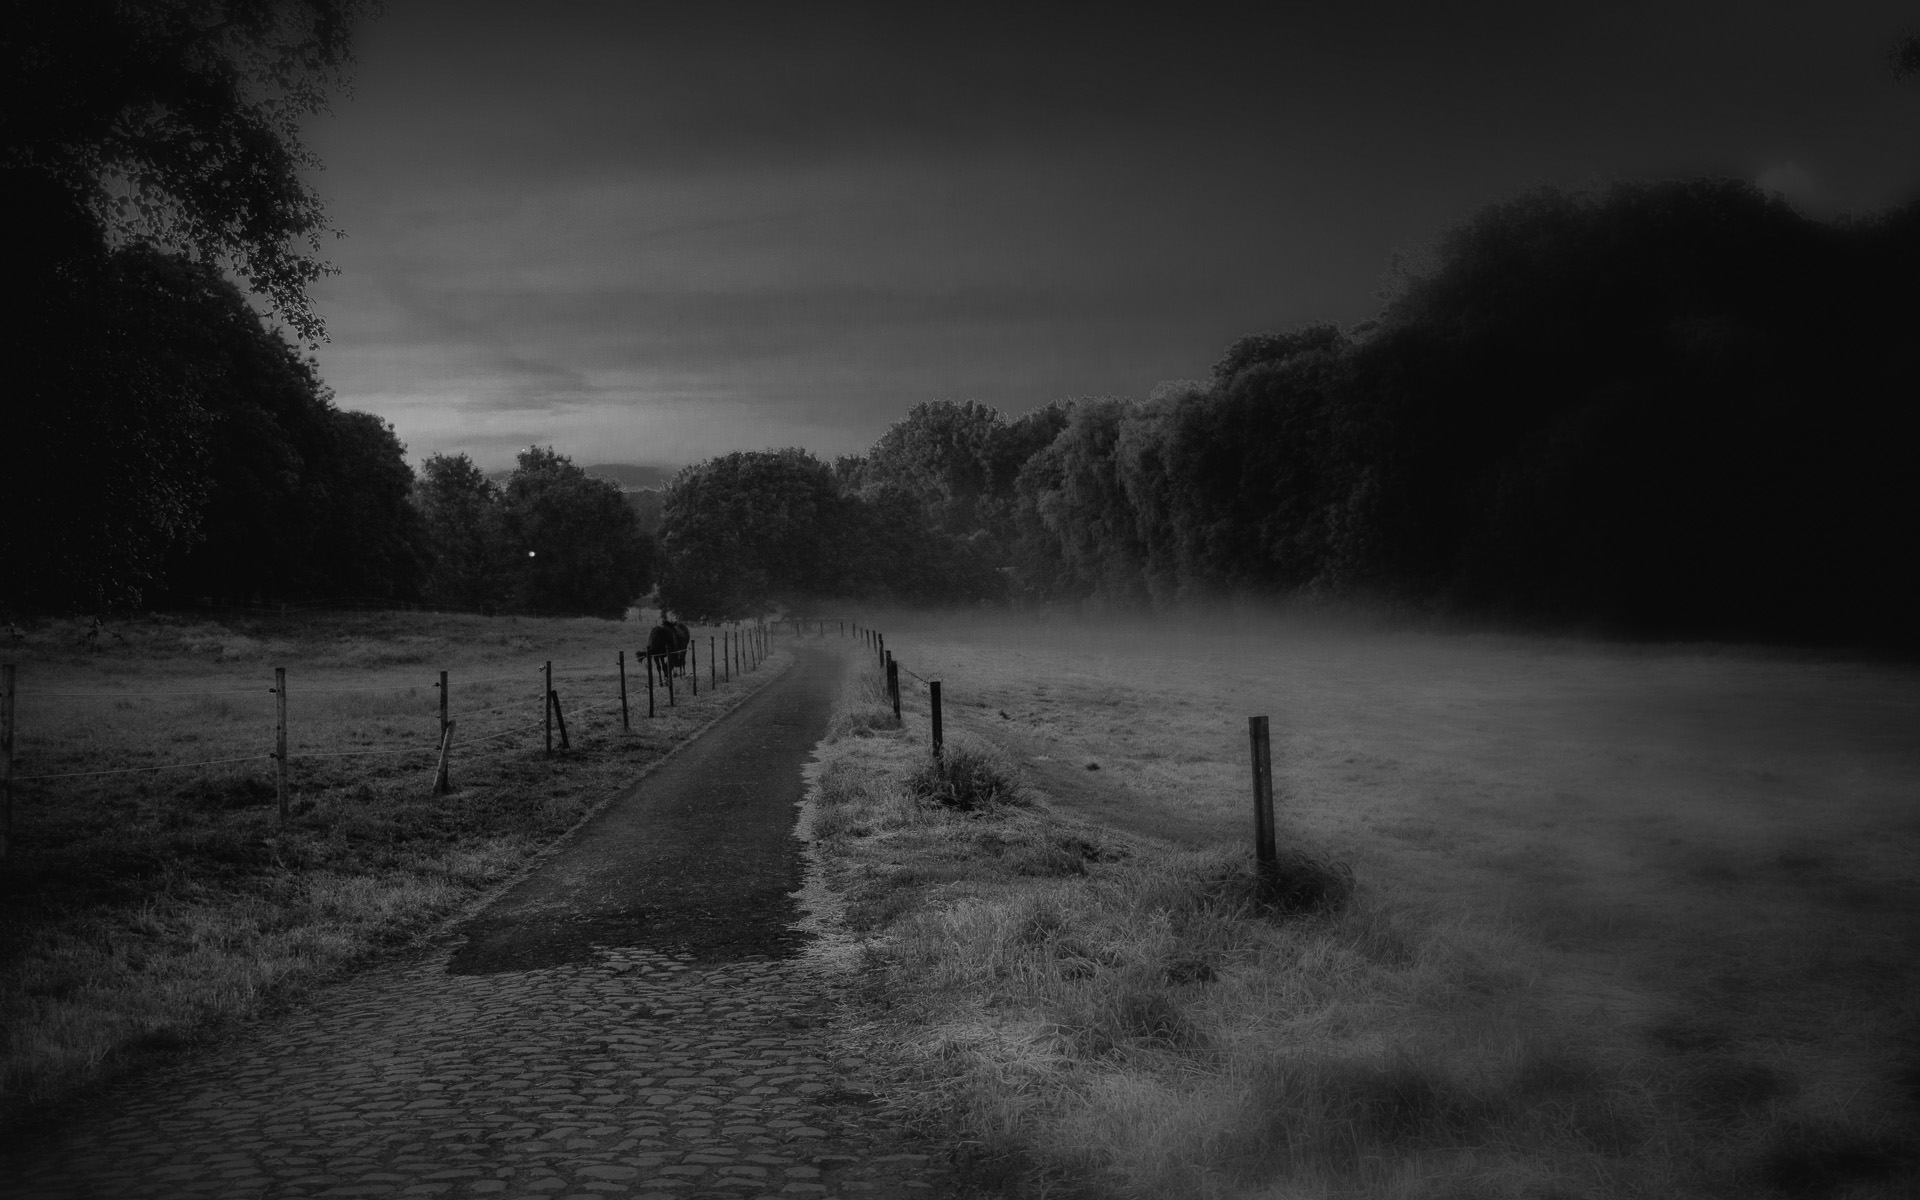 Night photography par Marc Feron